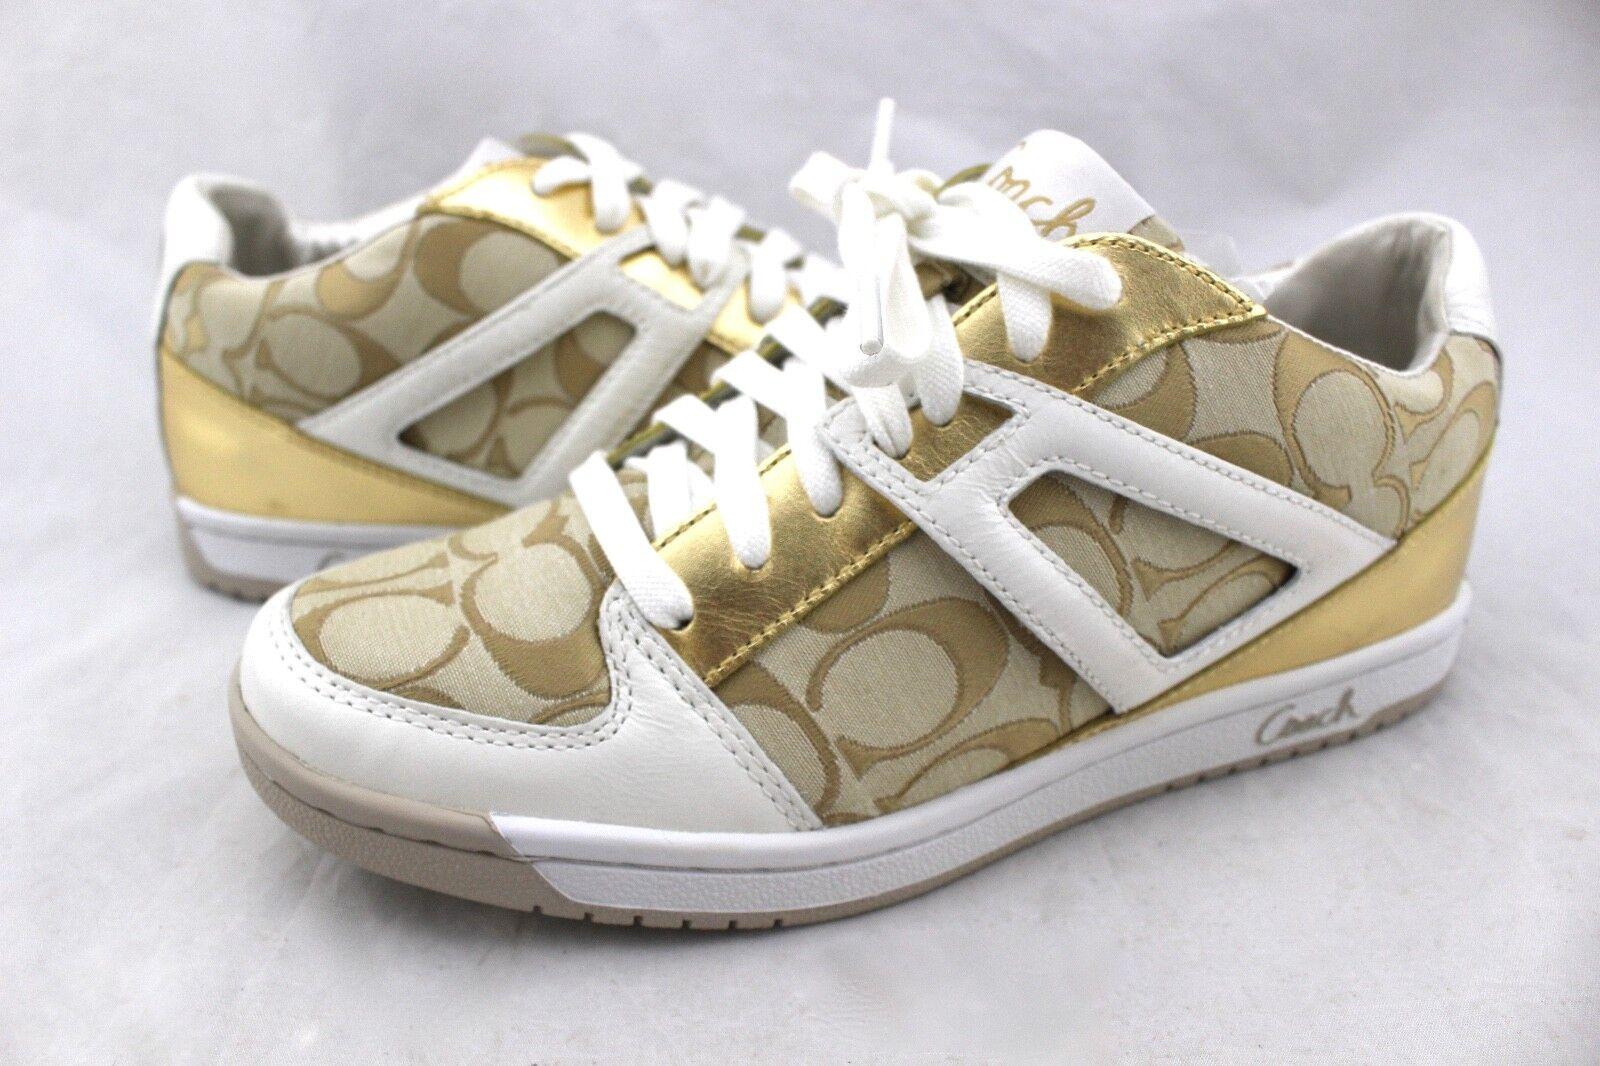 COACH Nova Gold White Heart Signature Jacquard Canvas Leather Sneakers 8